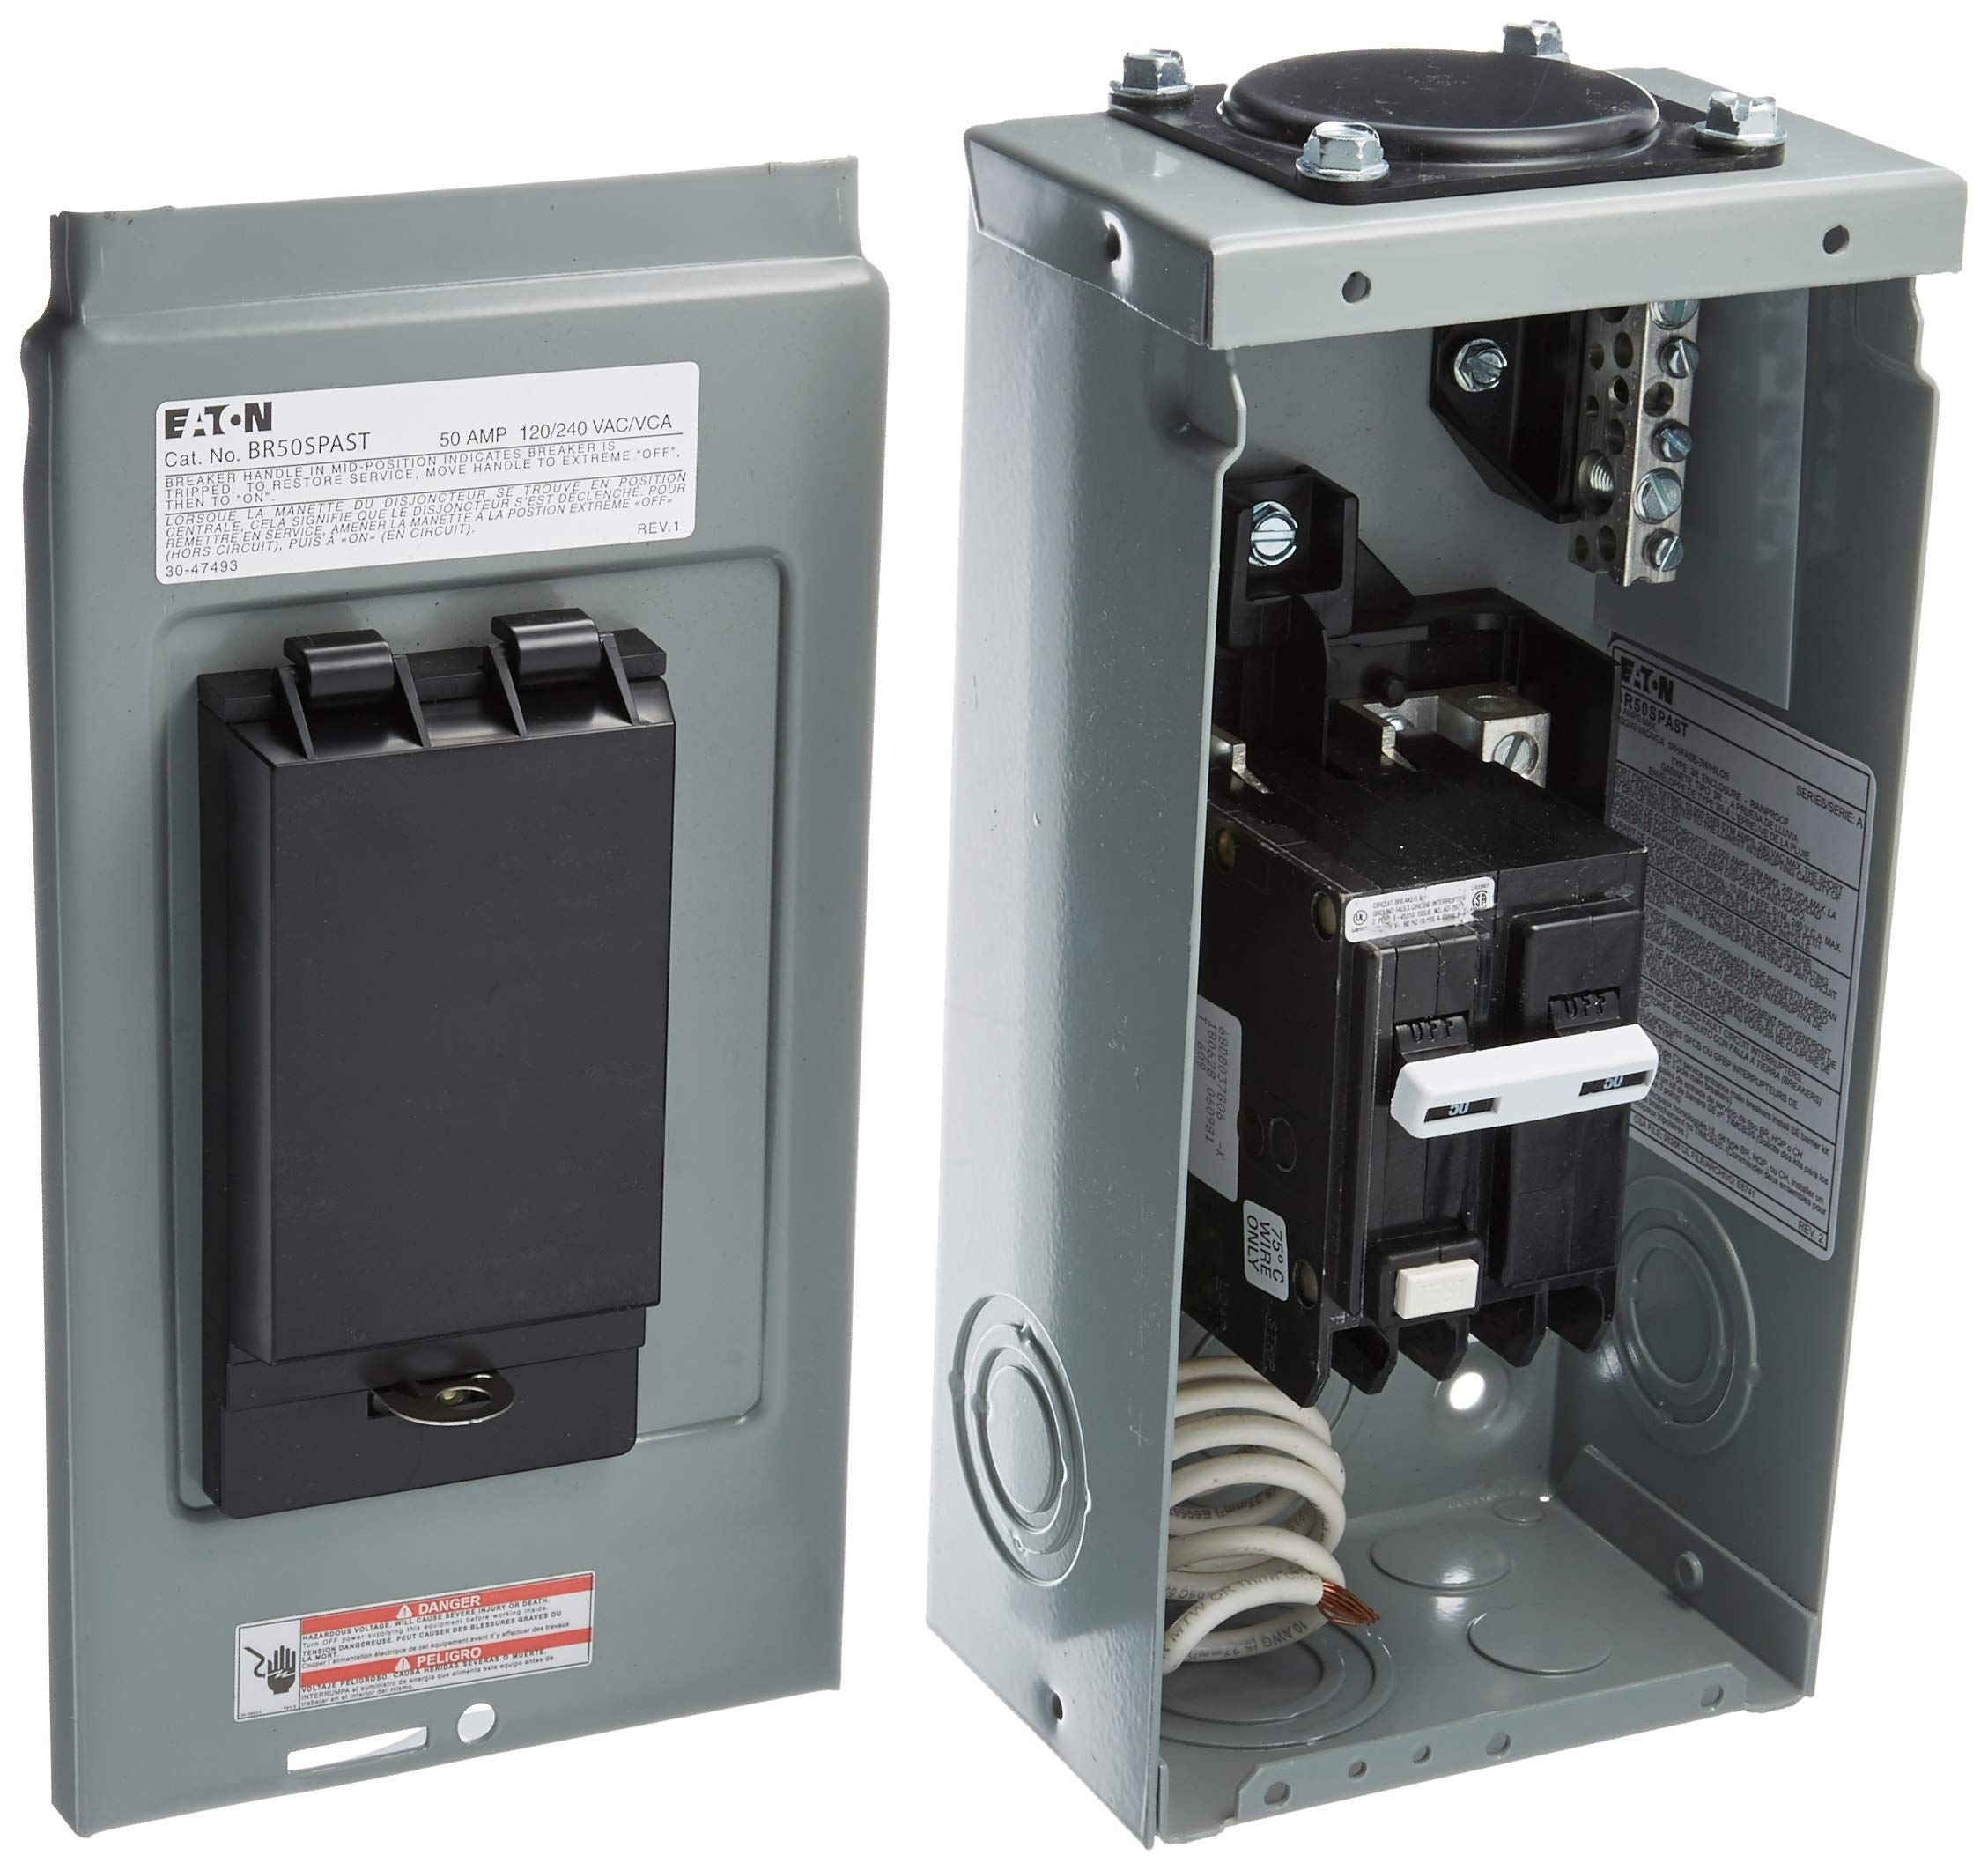 Bussmann CB285-120 Surface-Mount Circuit Breakers 120 Amps 1 per pack